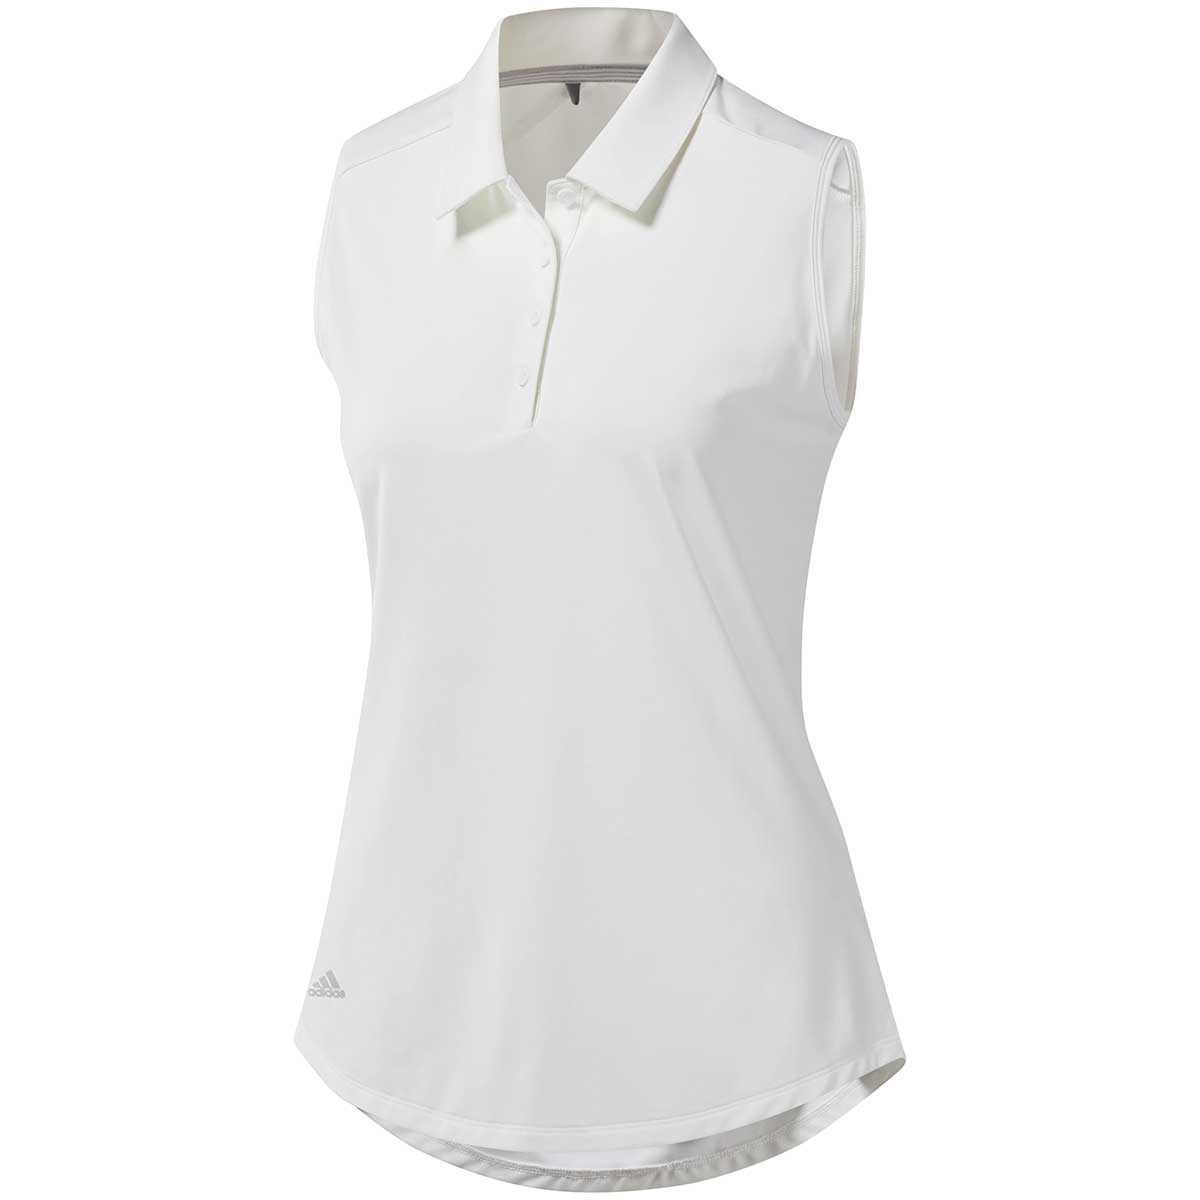 Adidas Women's Ultimate365 Sleeveless Polo Shirt White